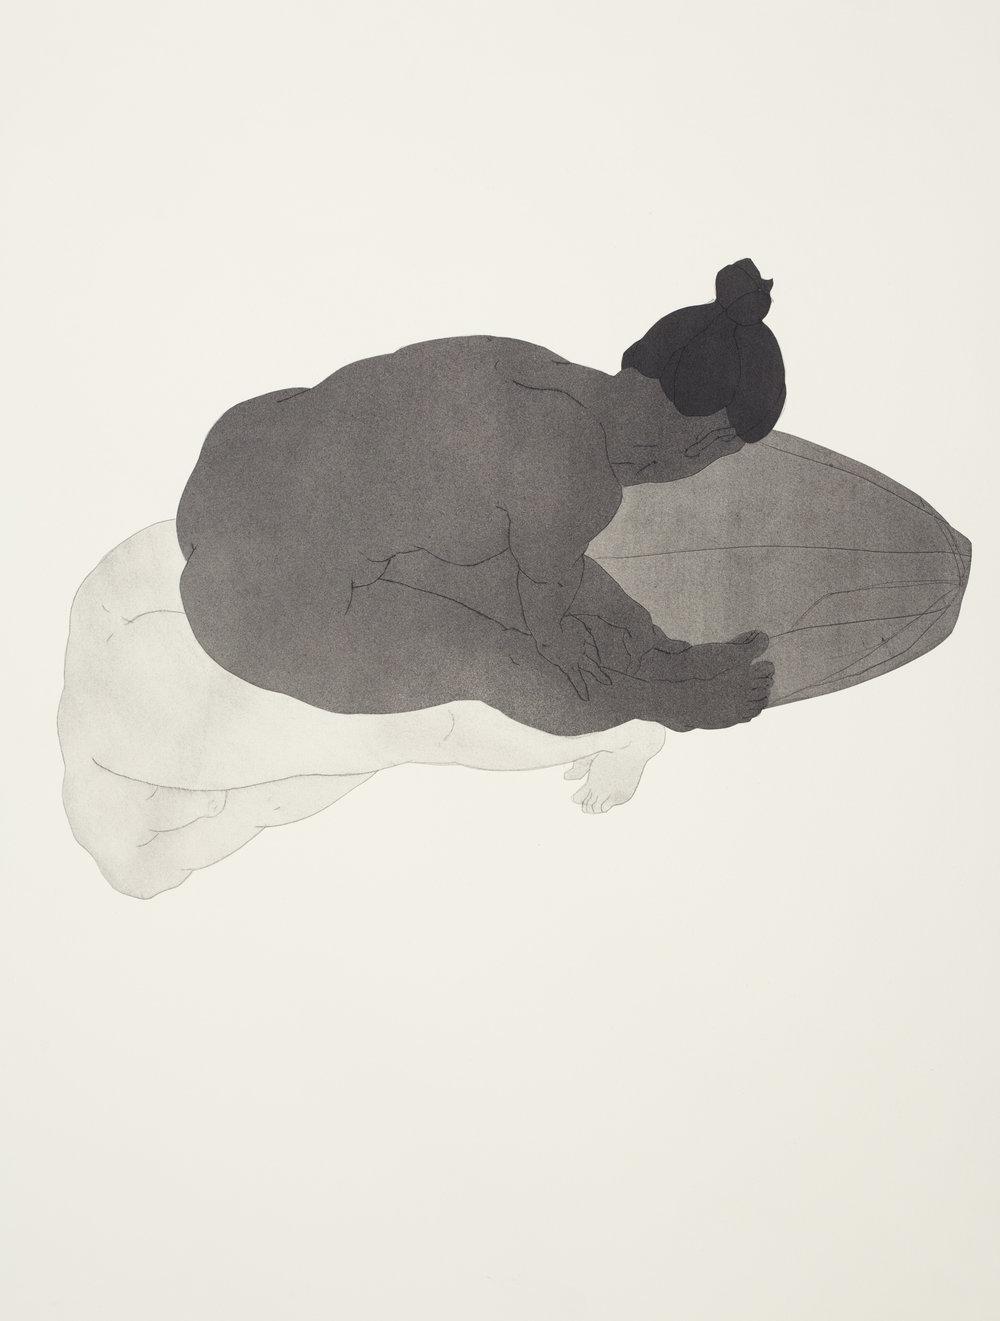 Untitled, 2014. (2014.01.005)